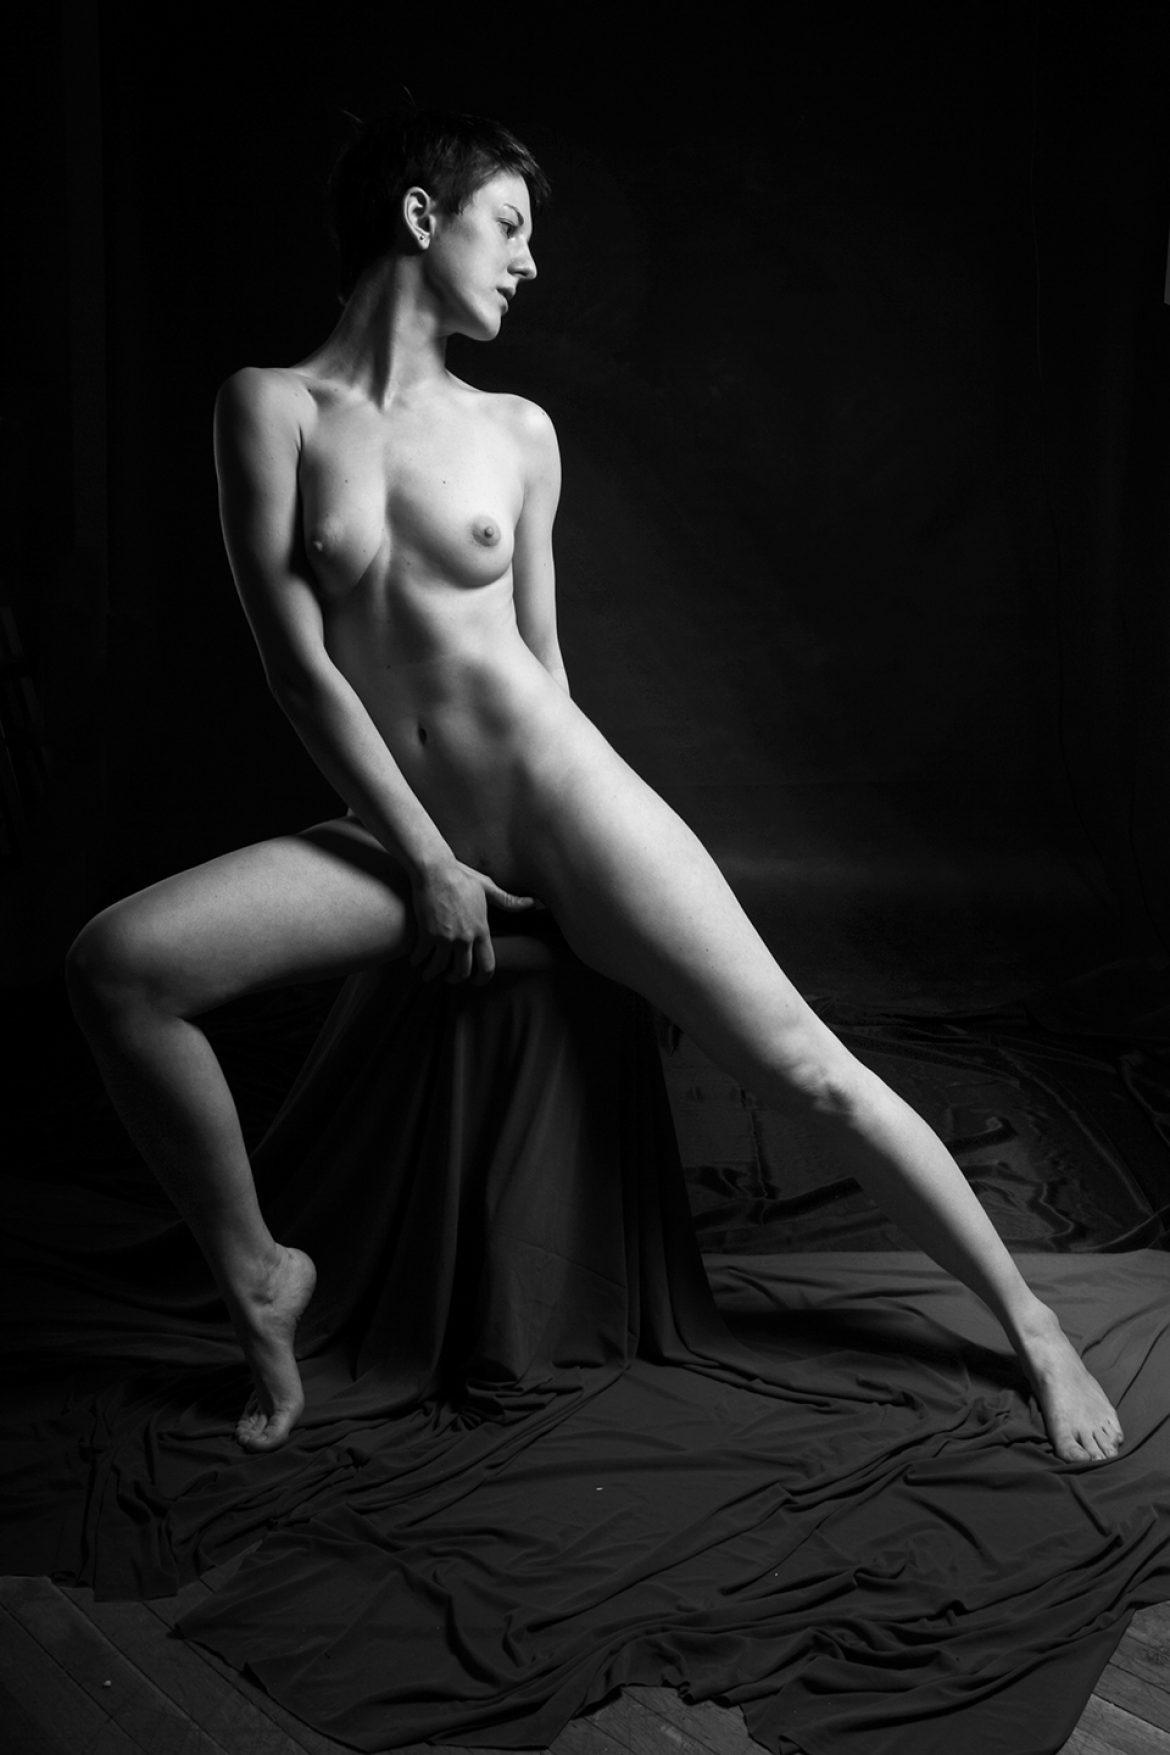 nude statuesque girl